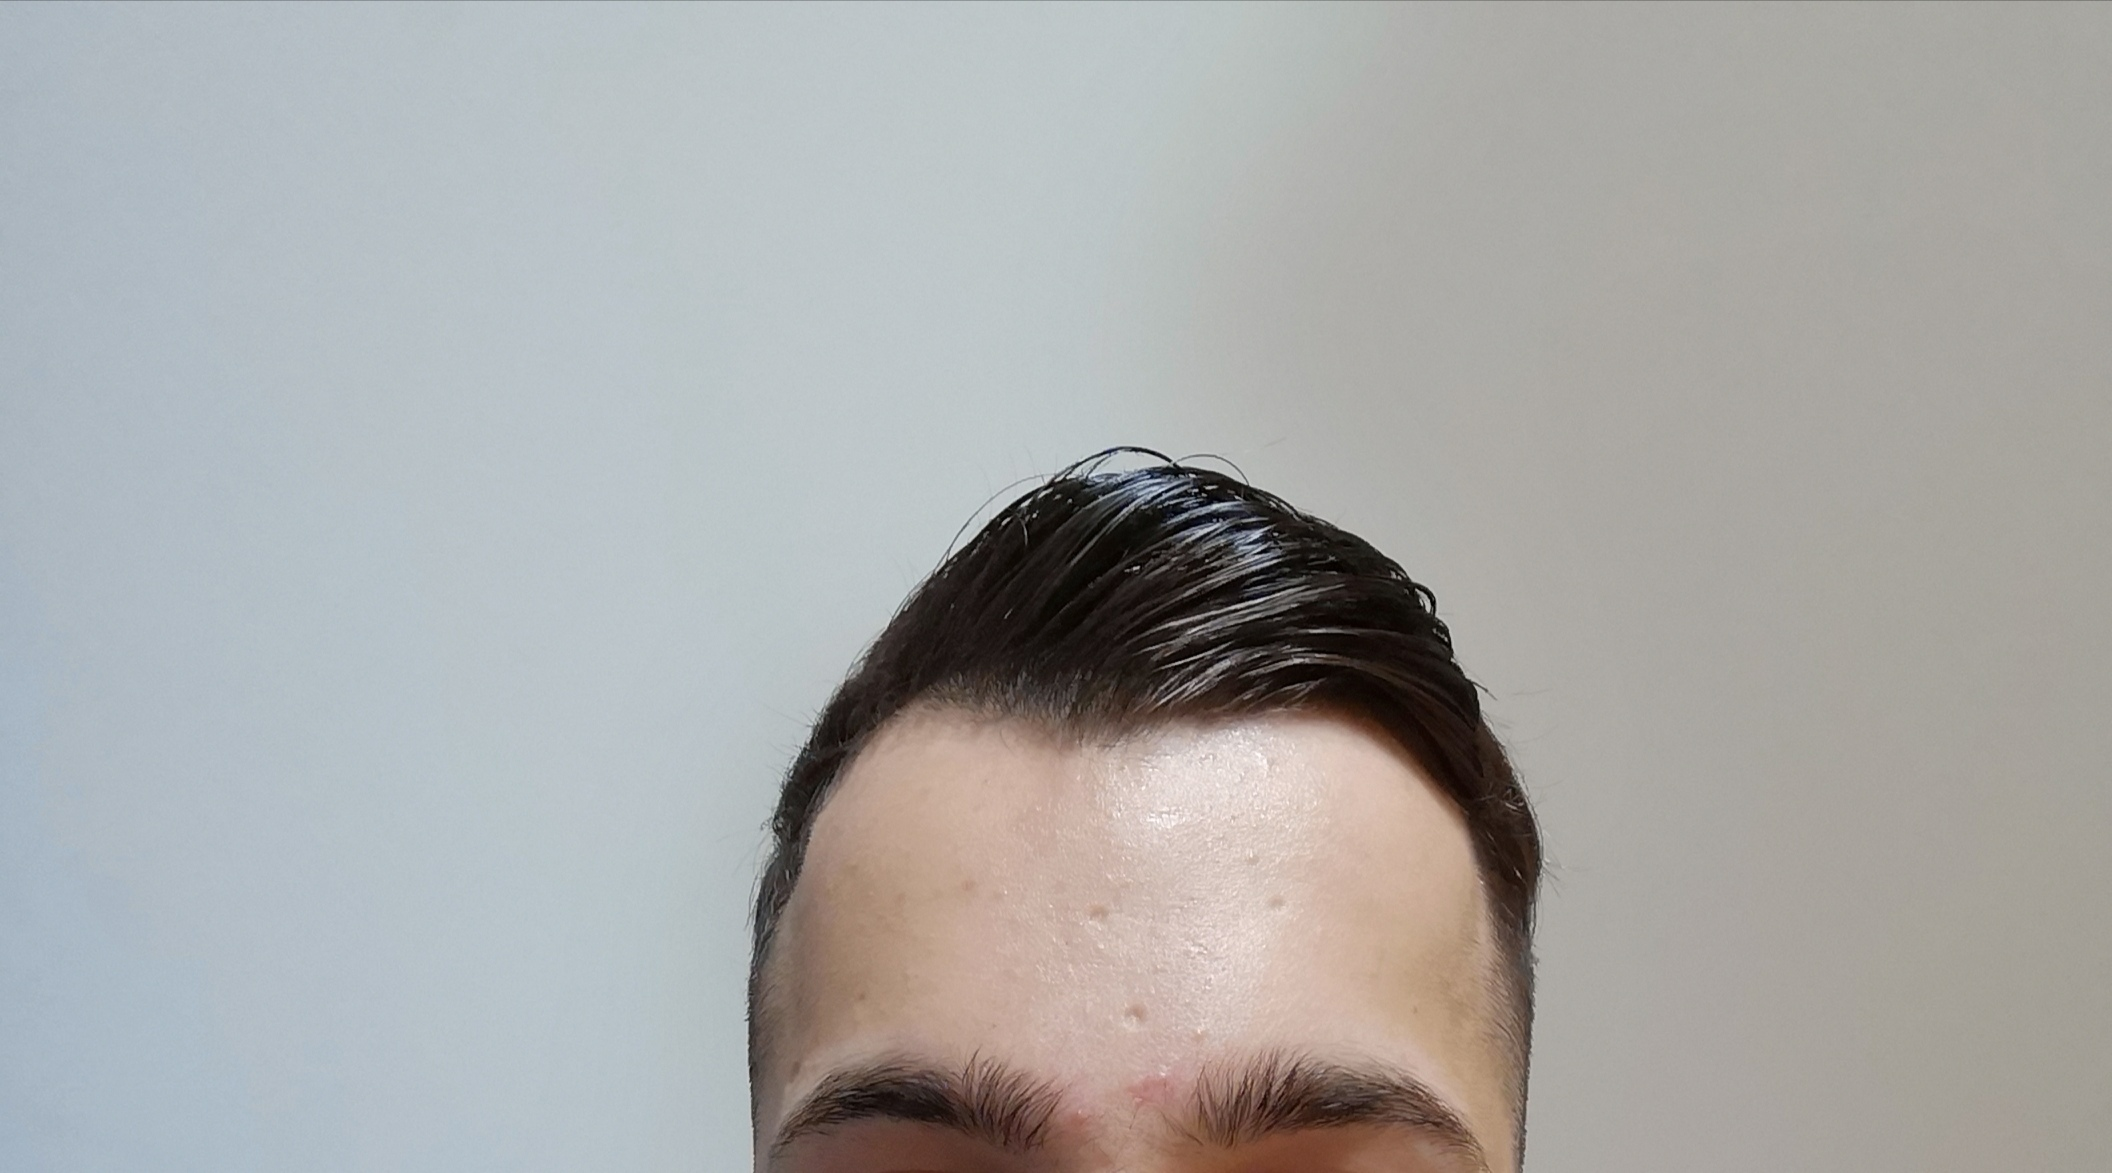 Glatze rasieren bei geheimratsecken? (Frisur, Haarausfall